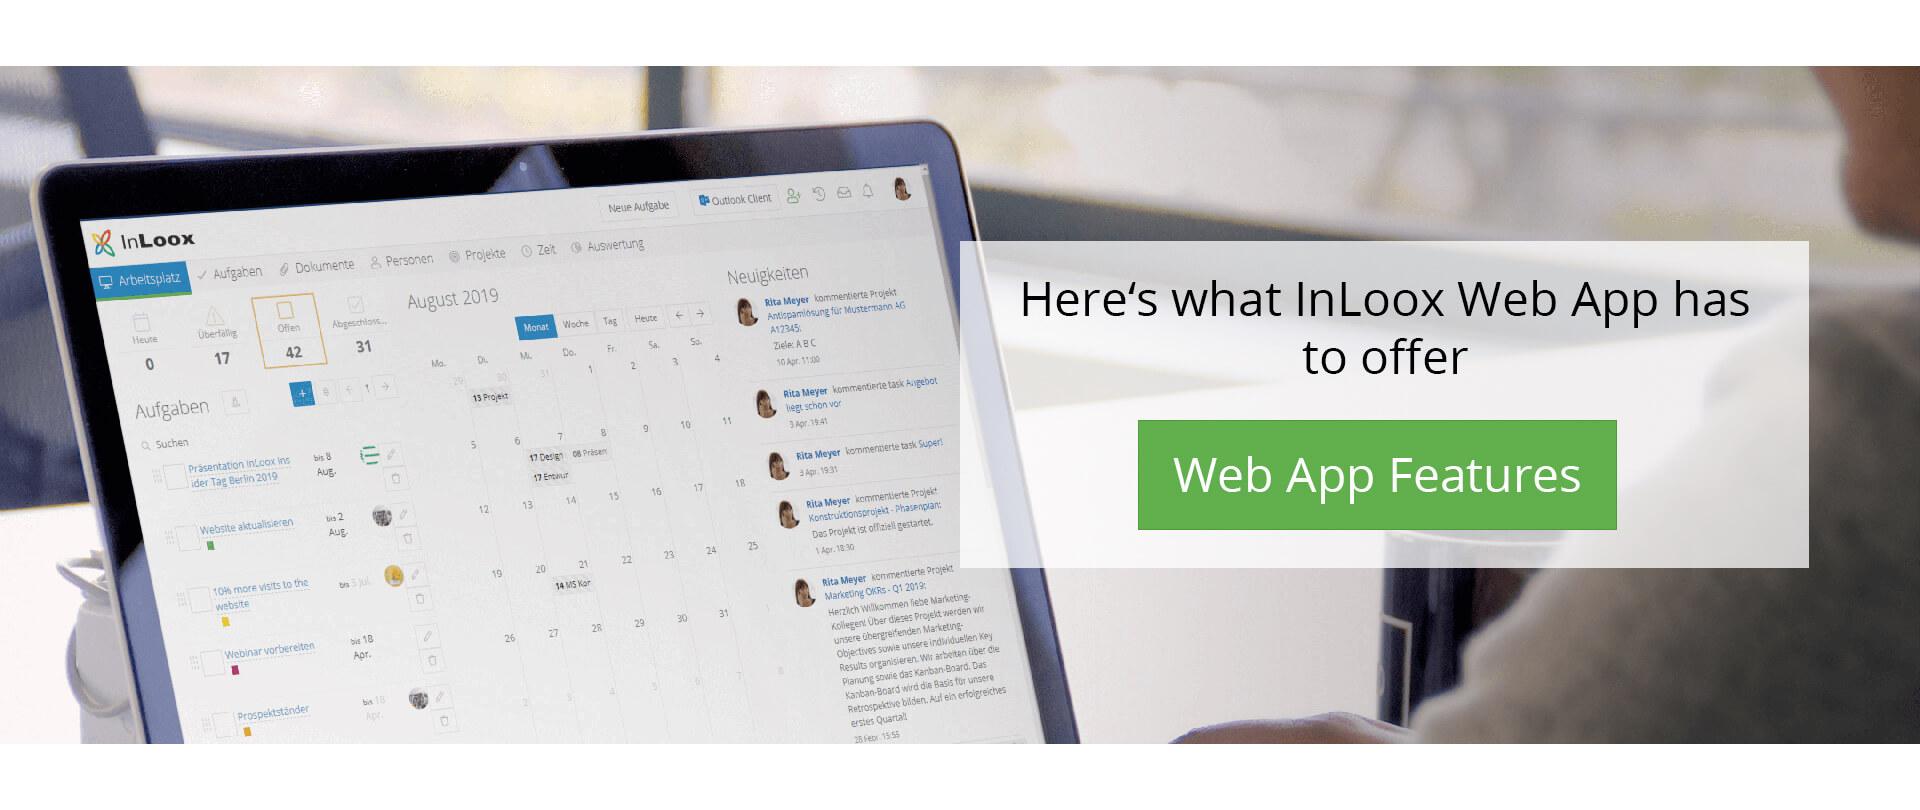 InLoox Web App for Mac, iPhone and iPad